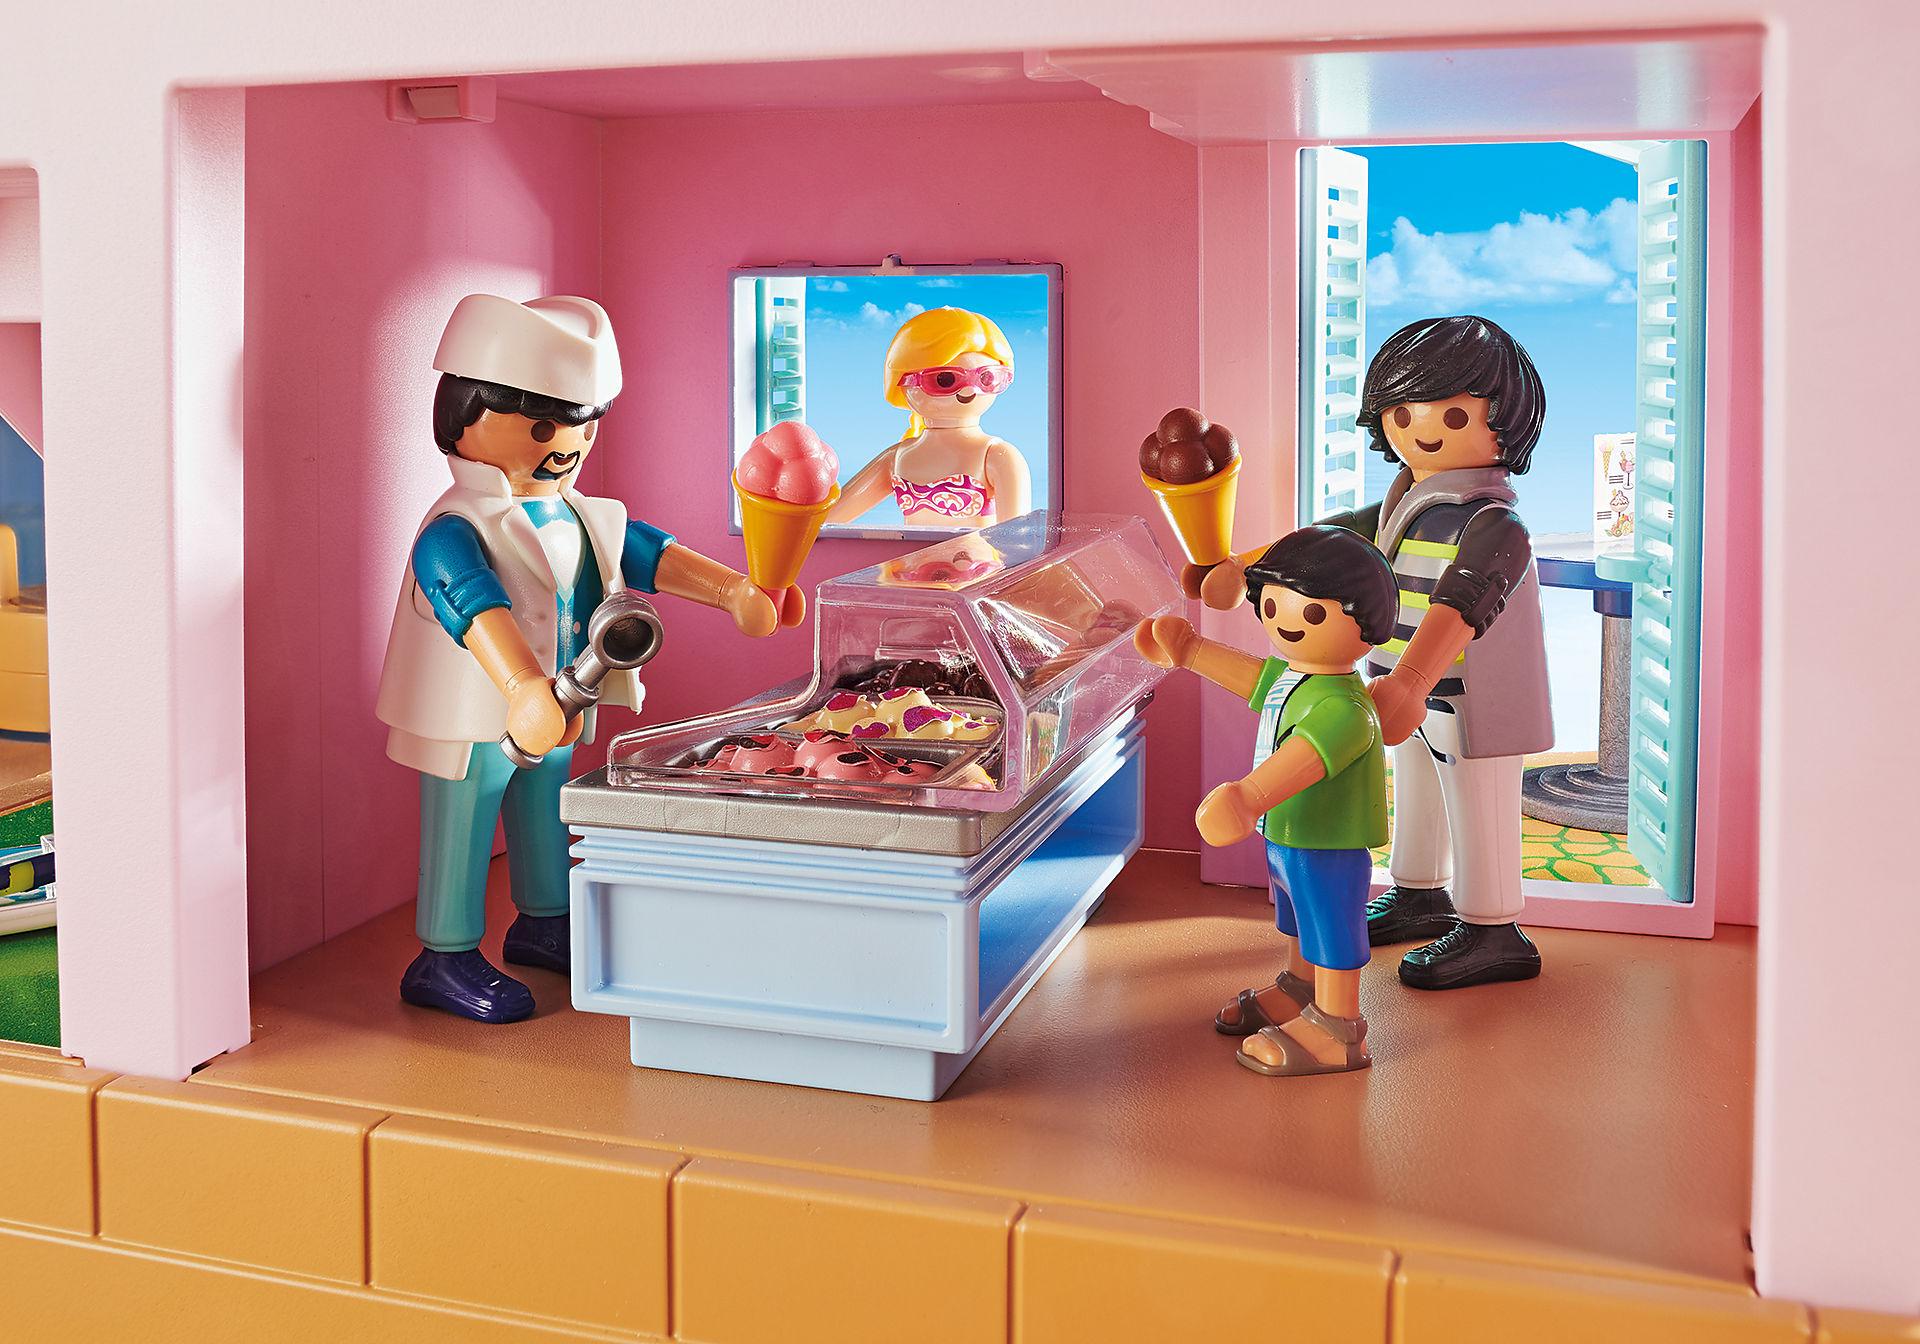 70279 Waterfront Ice Cream Shop zoom image5